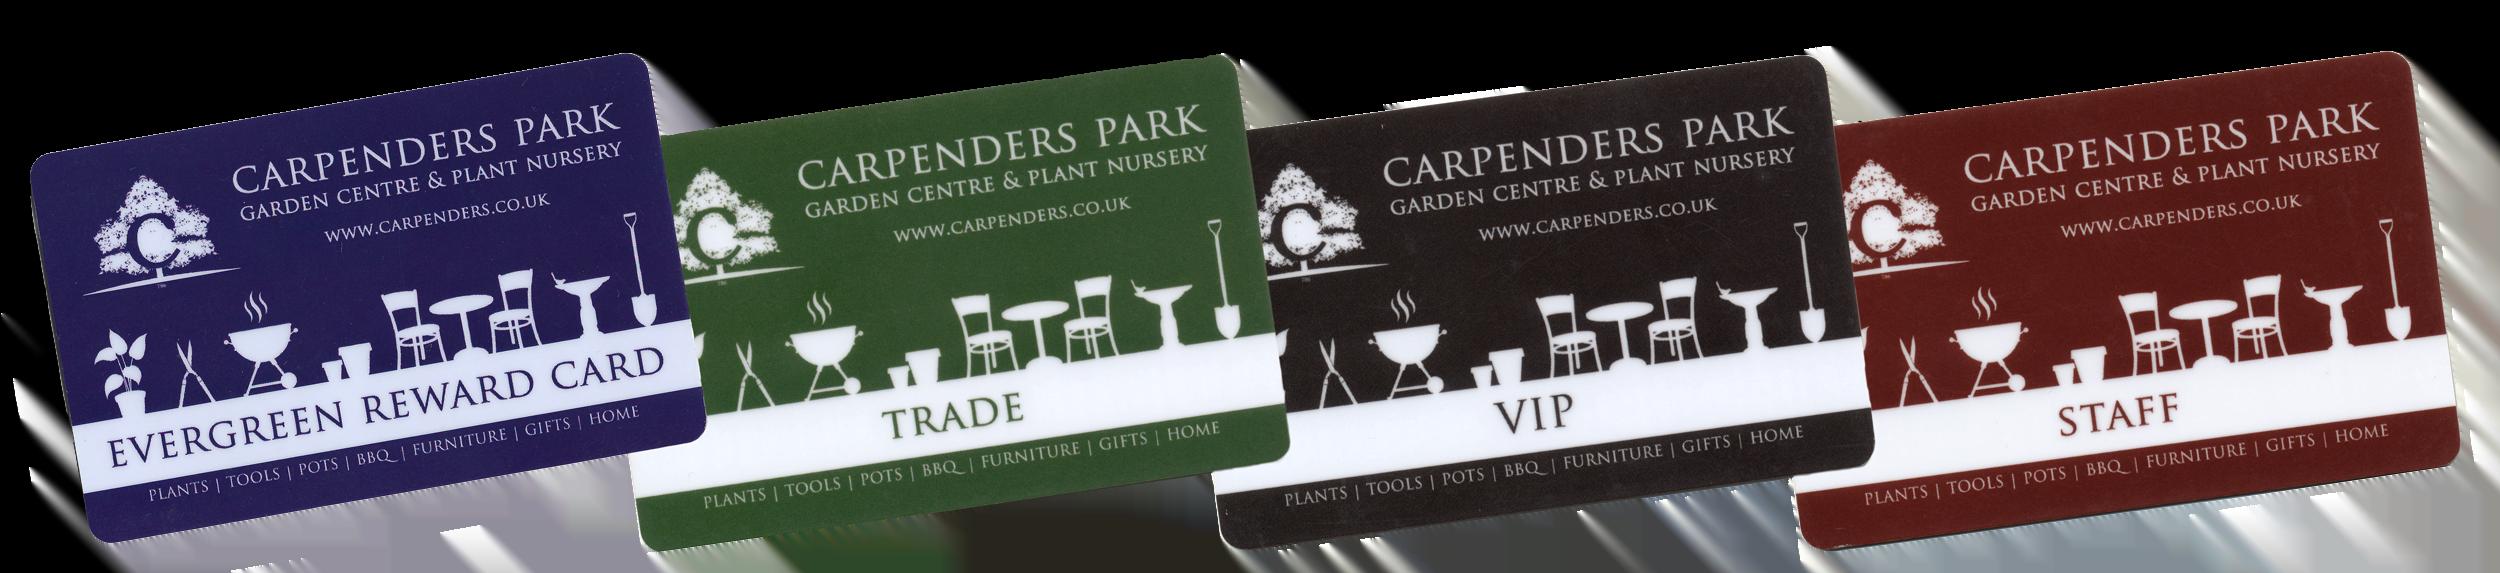 Carpenders Park Loyalty cards